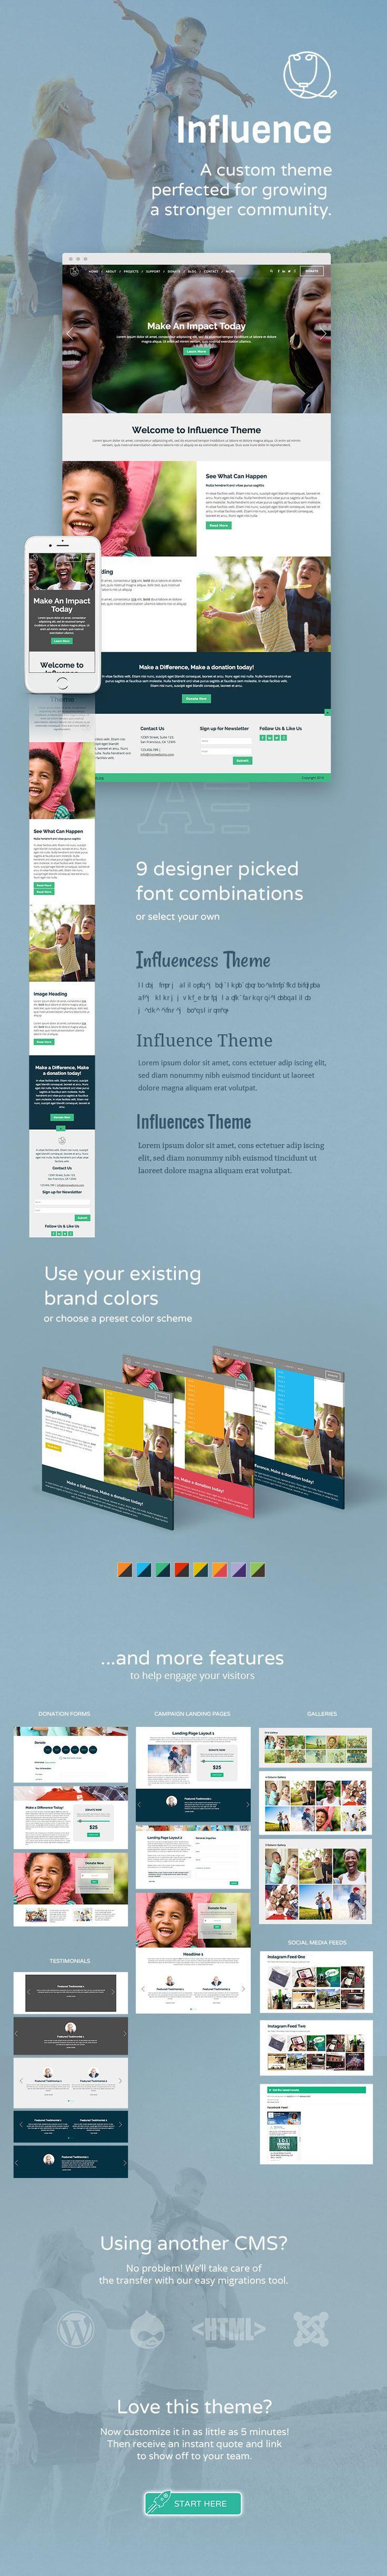 Influence Theme - Morweb.org